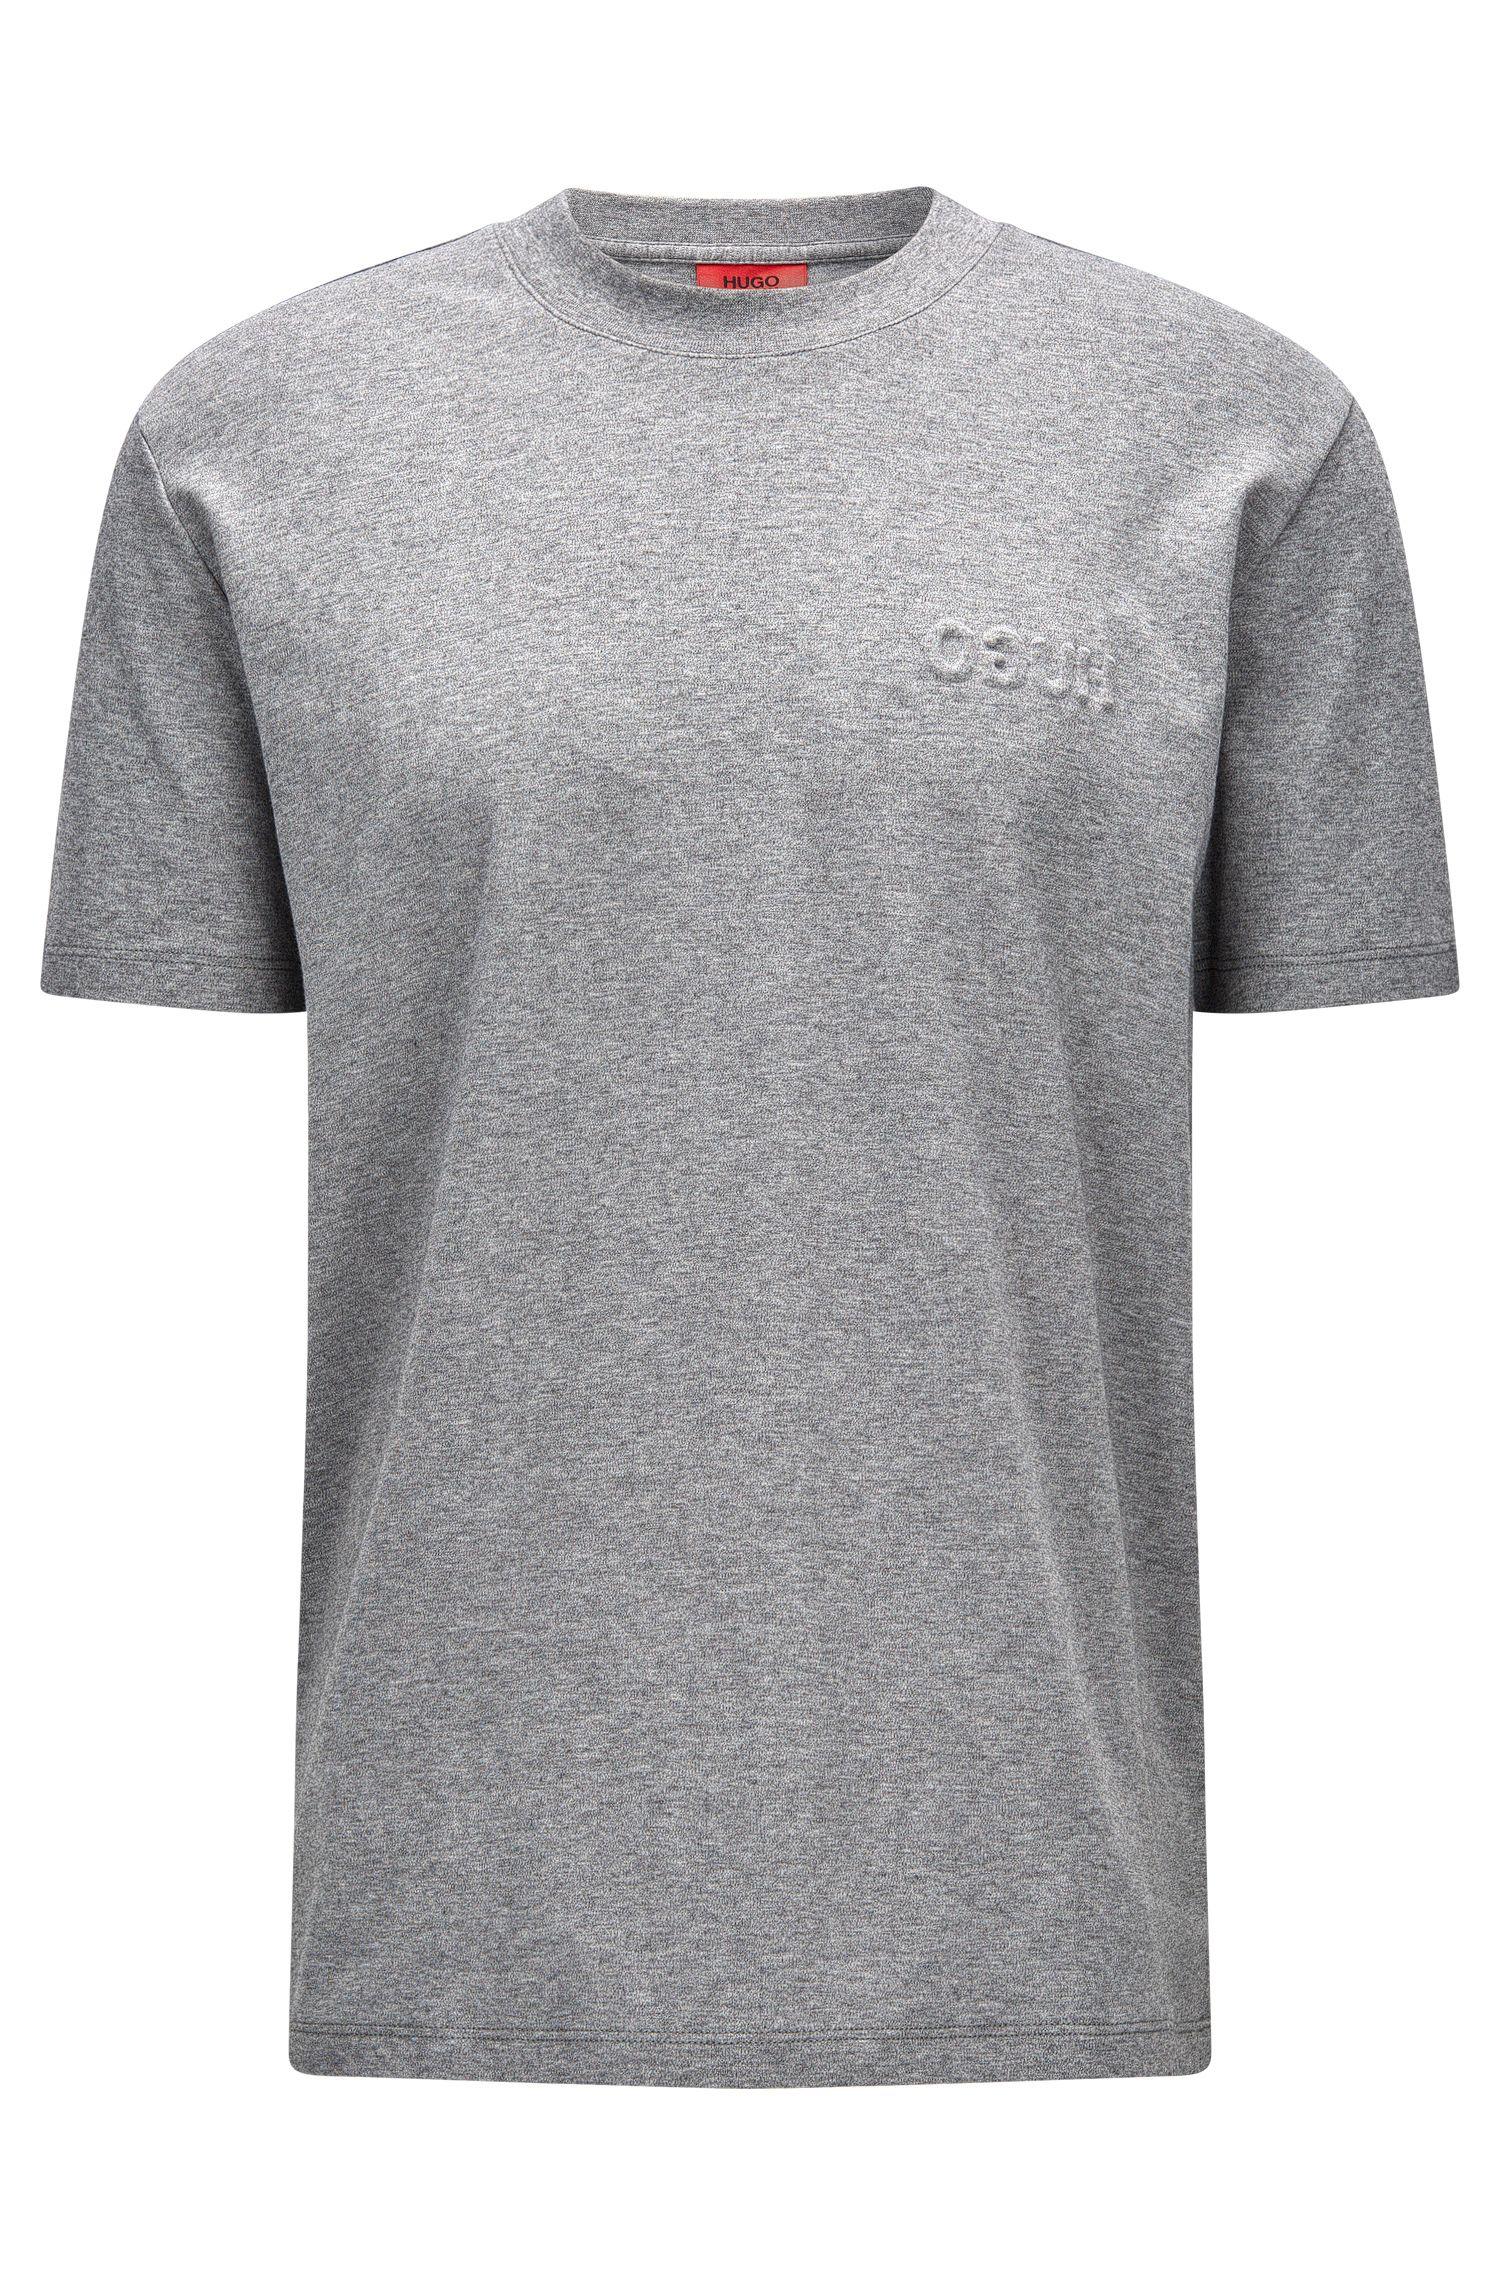 Oversize Shirt aus Pima-Baumwolle